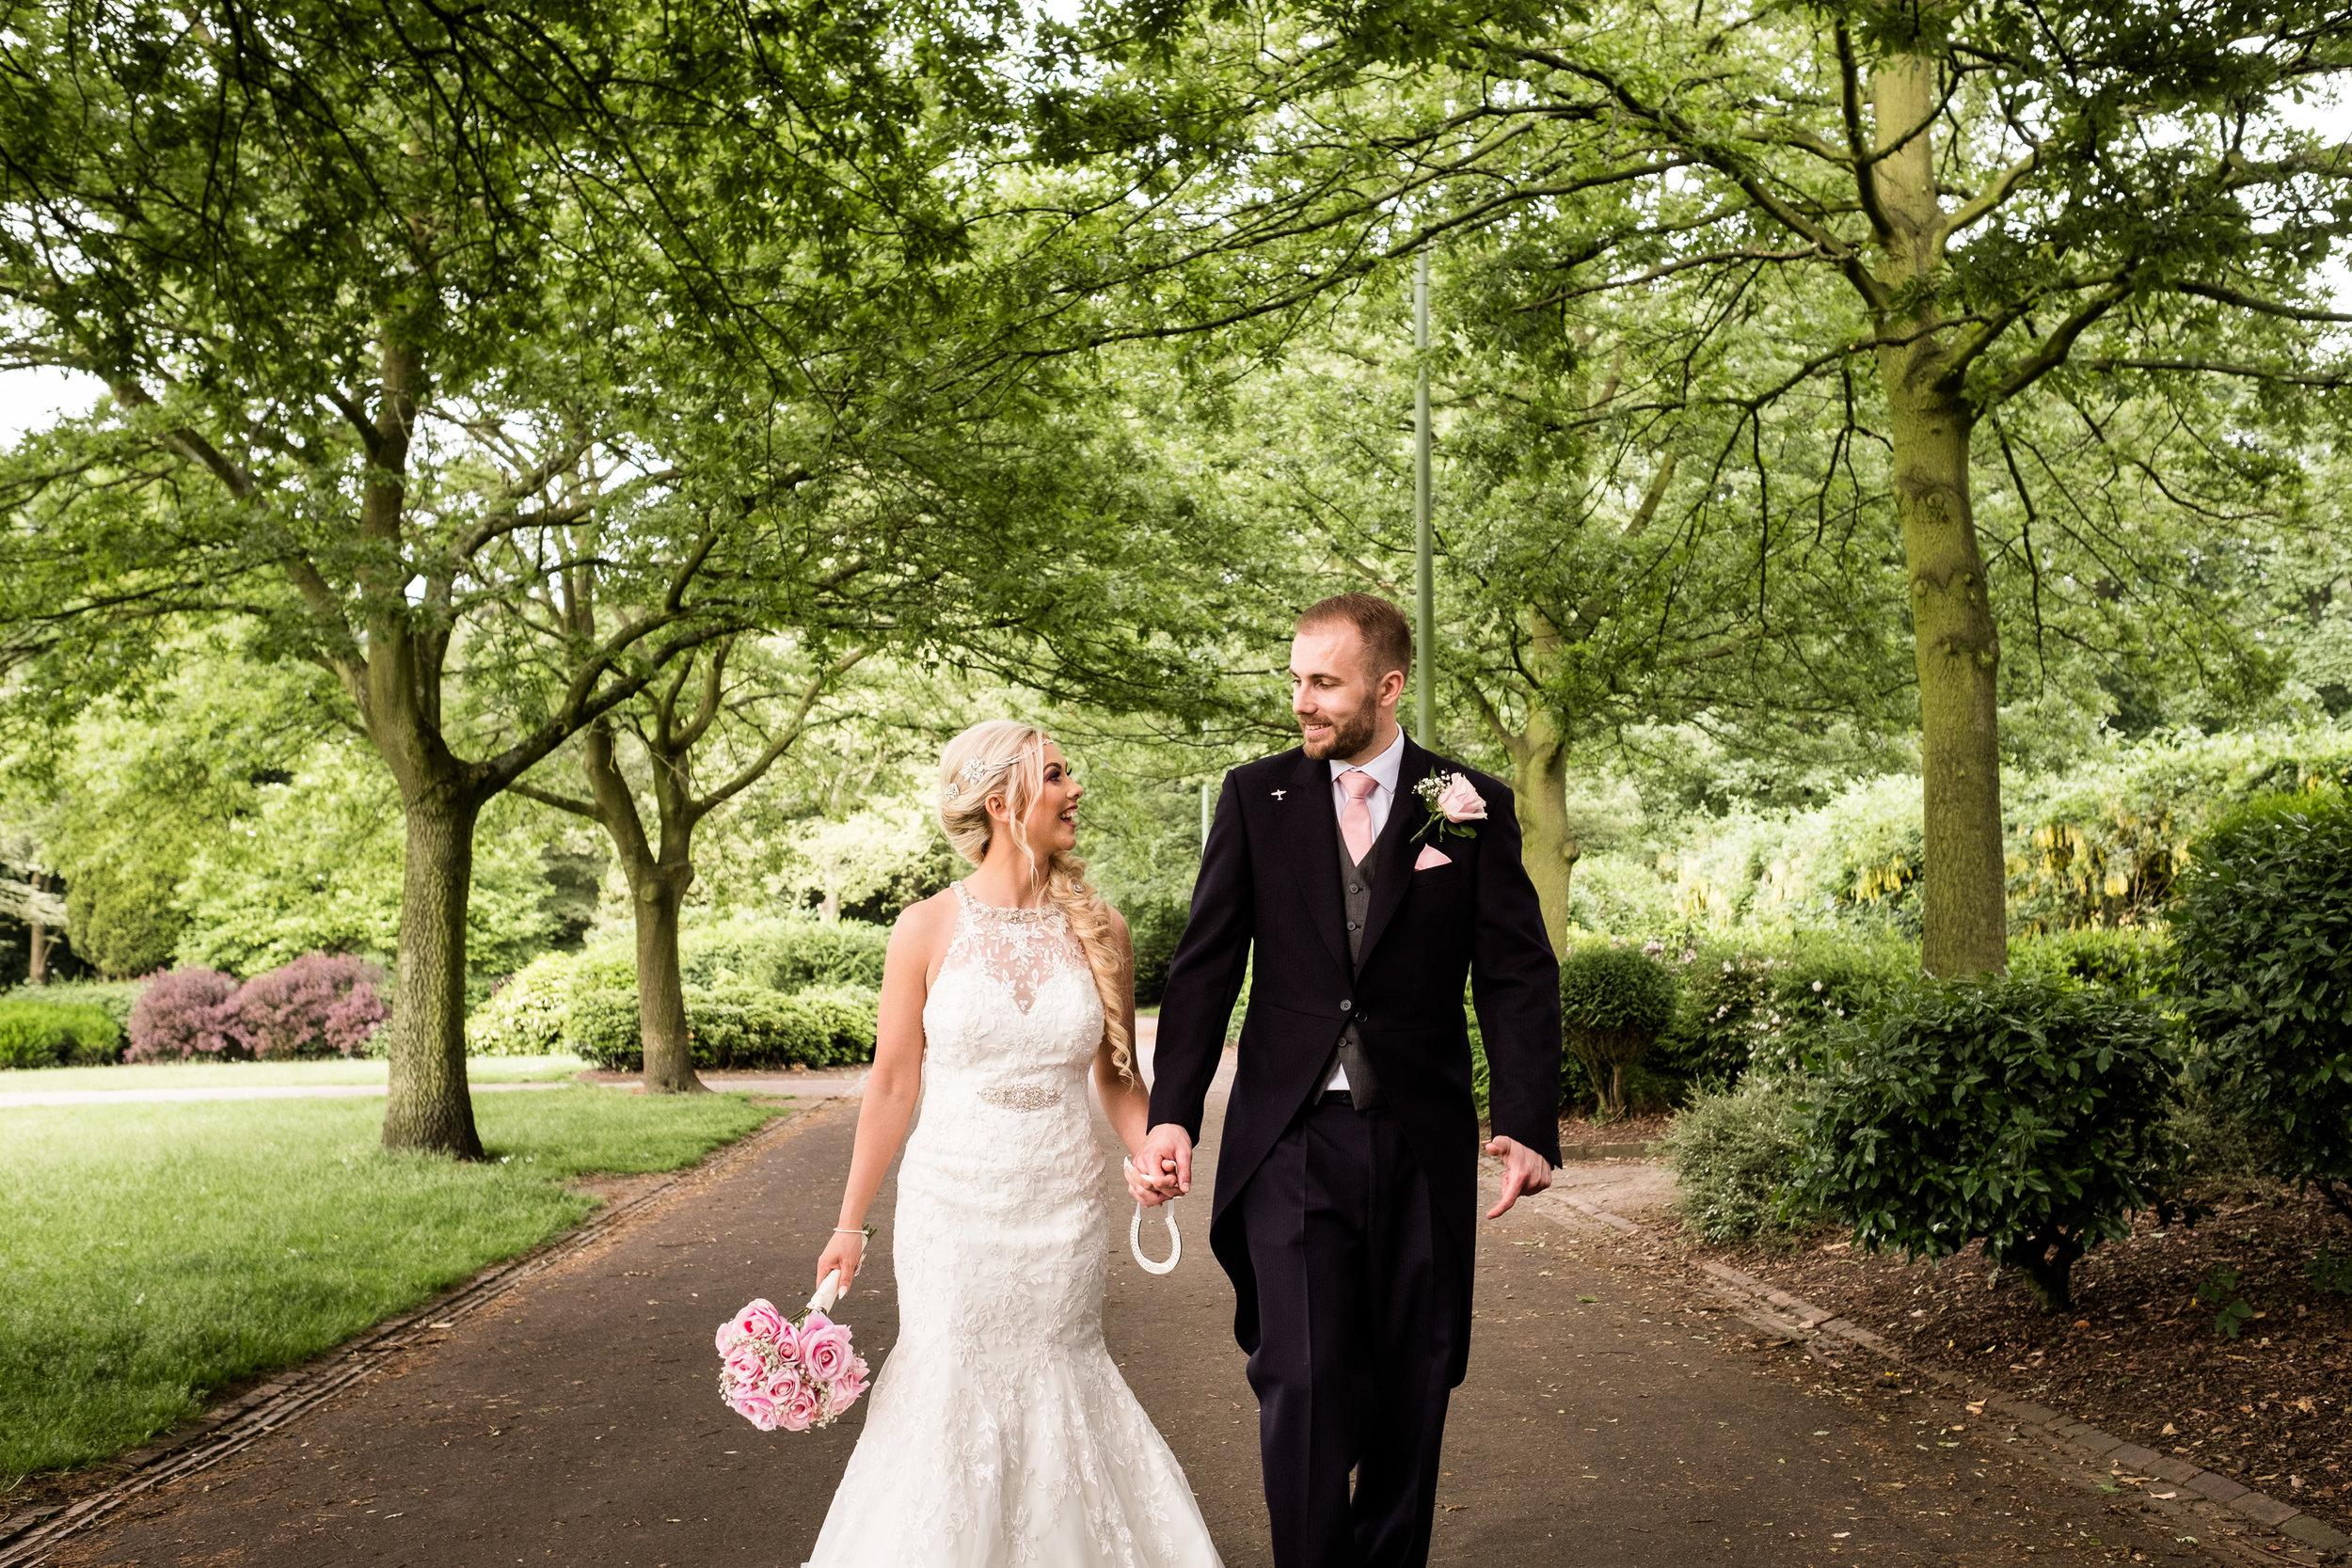 Summer Documentary Wedding Photography Floral Hall, Stoke-on-Trent, Staffordshire - Jenny Harper-37.jpg